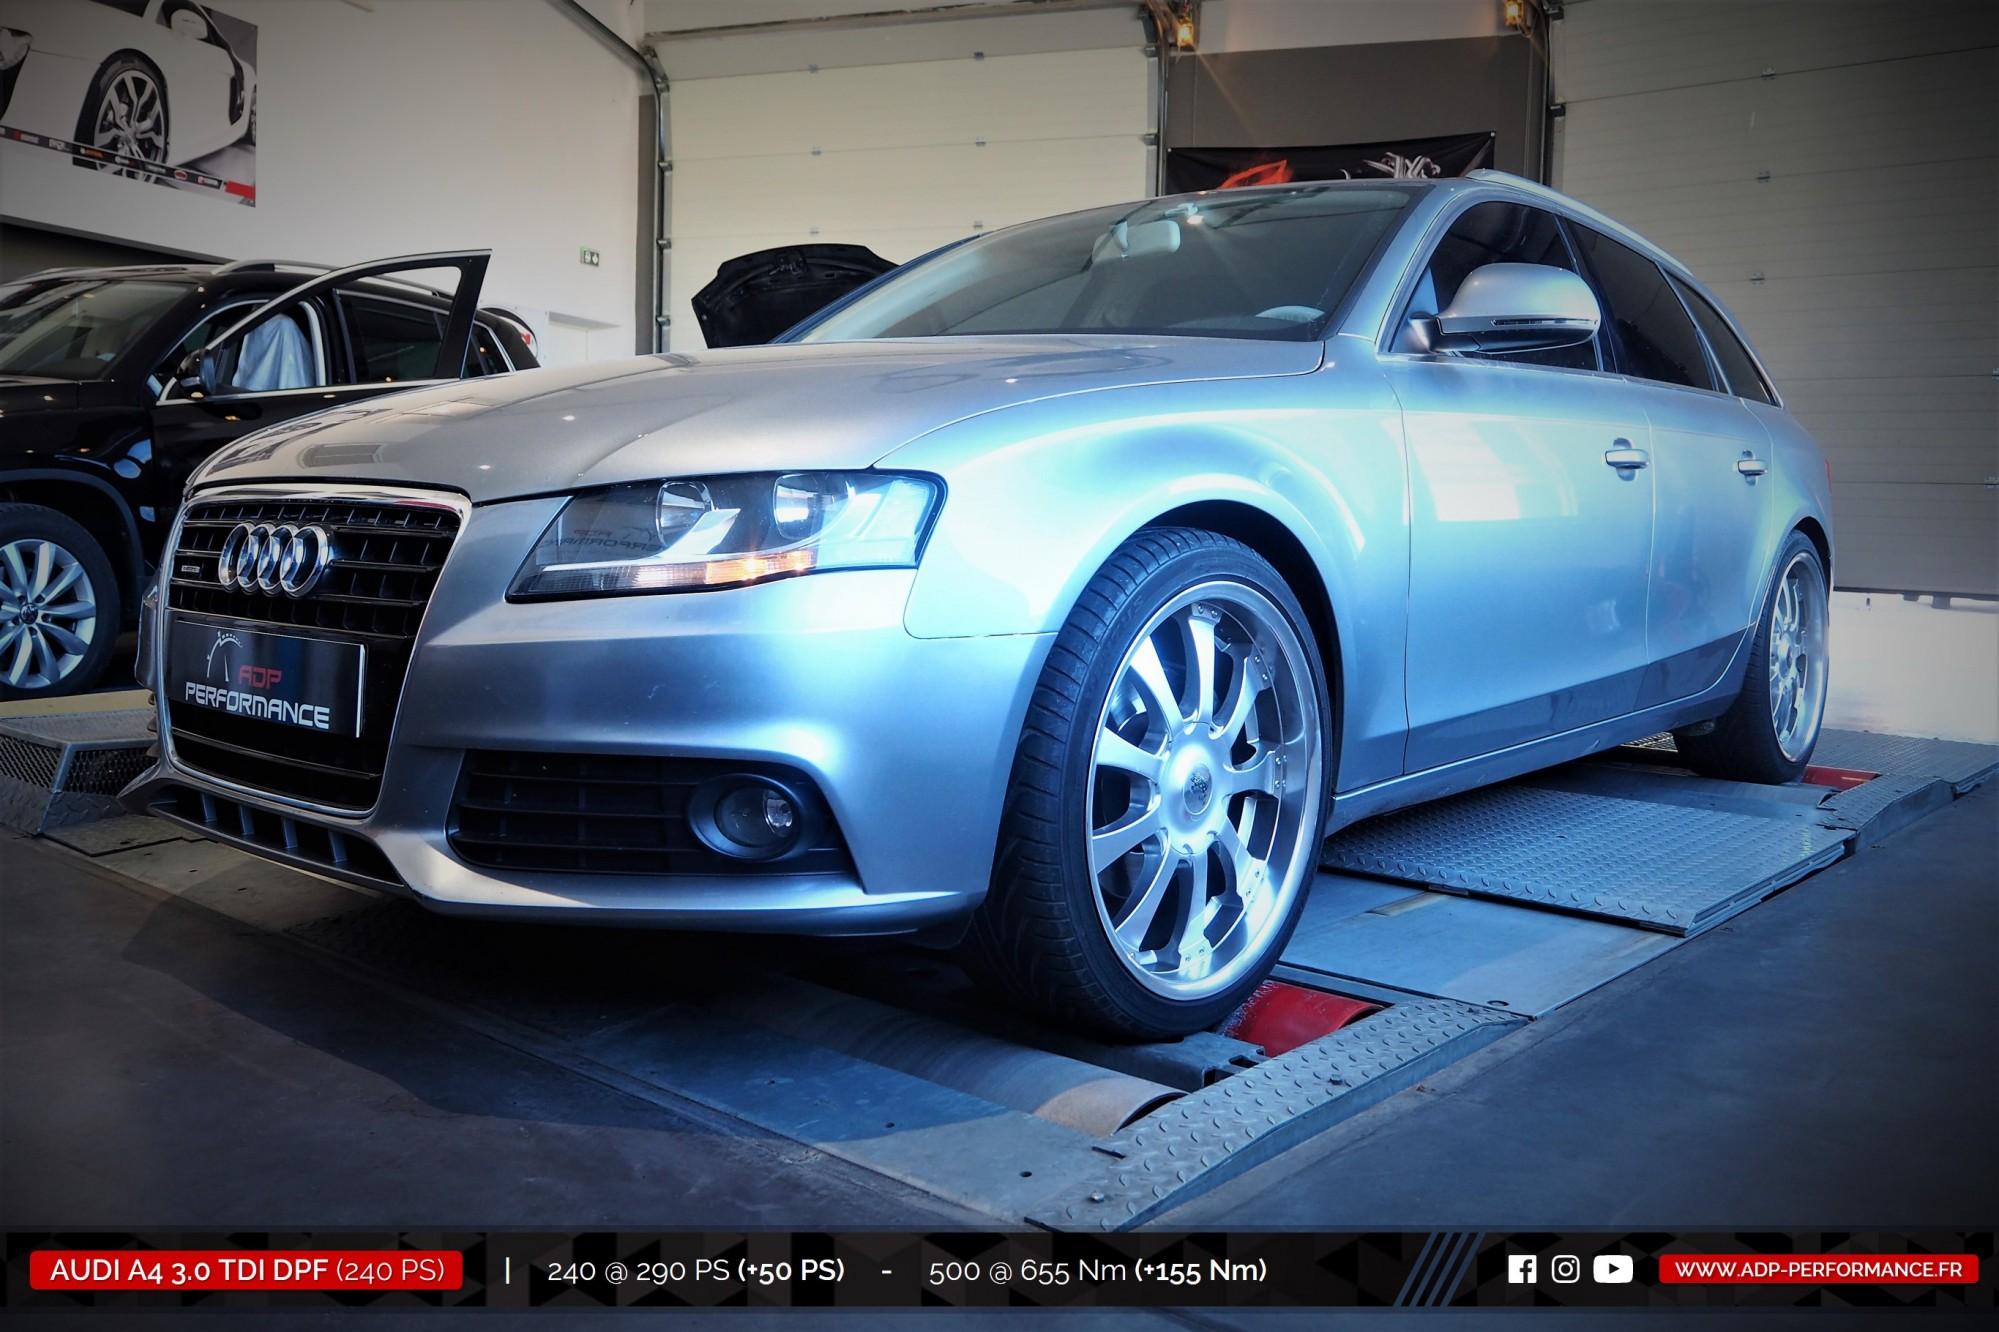 Reprogrammation moteur Marignane, Vitrolles, St Victoret - Audi A4 3.0 TDI DPF 240cv - ADP Performance